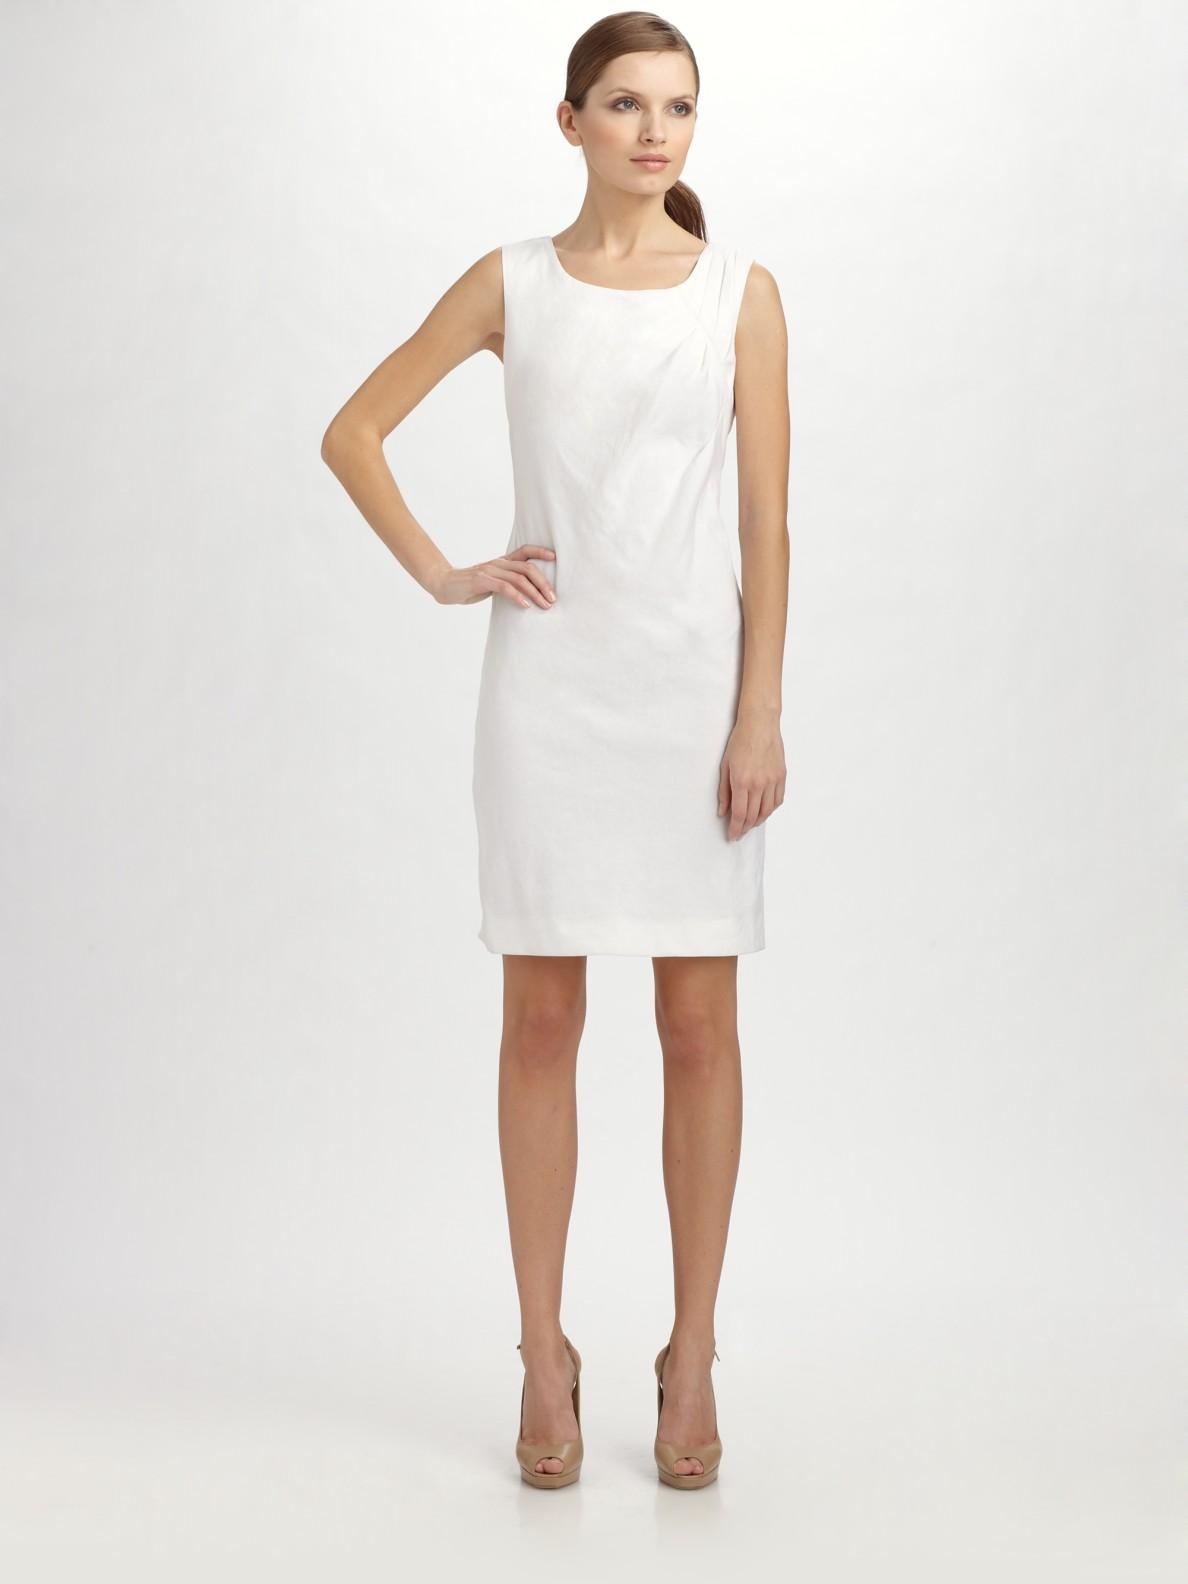 Dkny Stretch Spring Linen Tank Dress In White Lyst